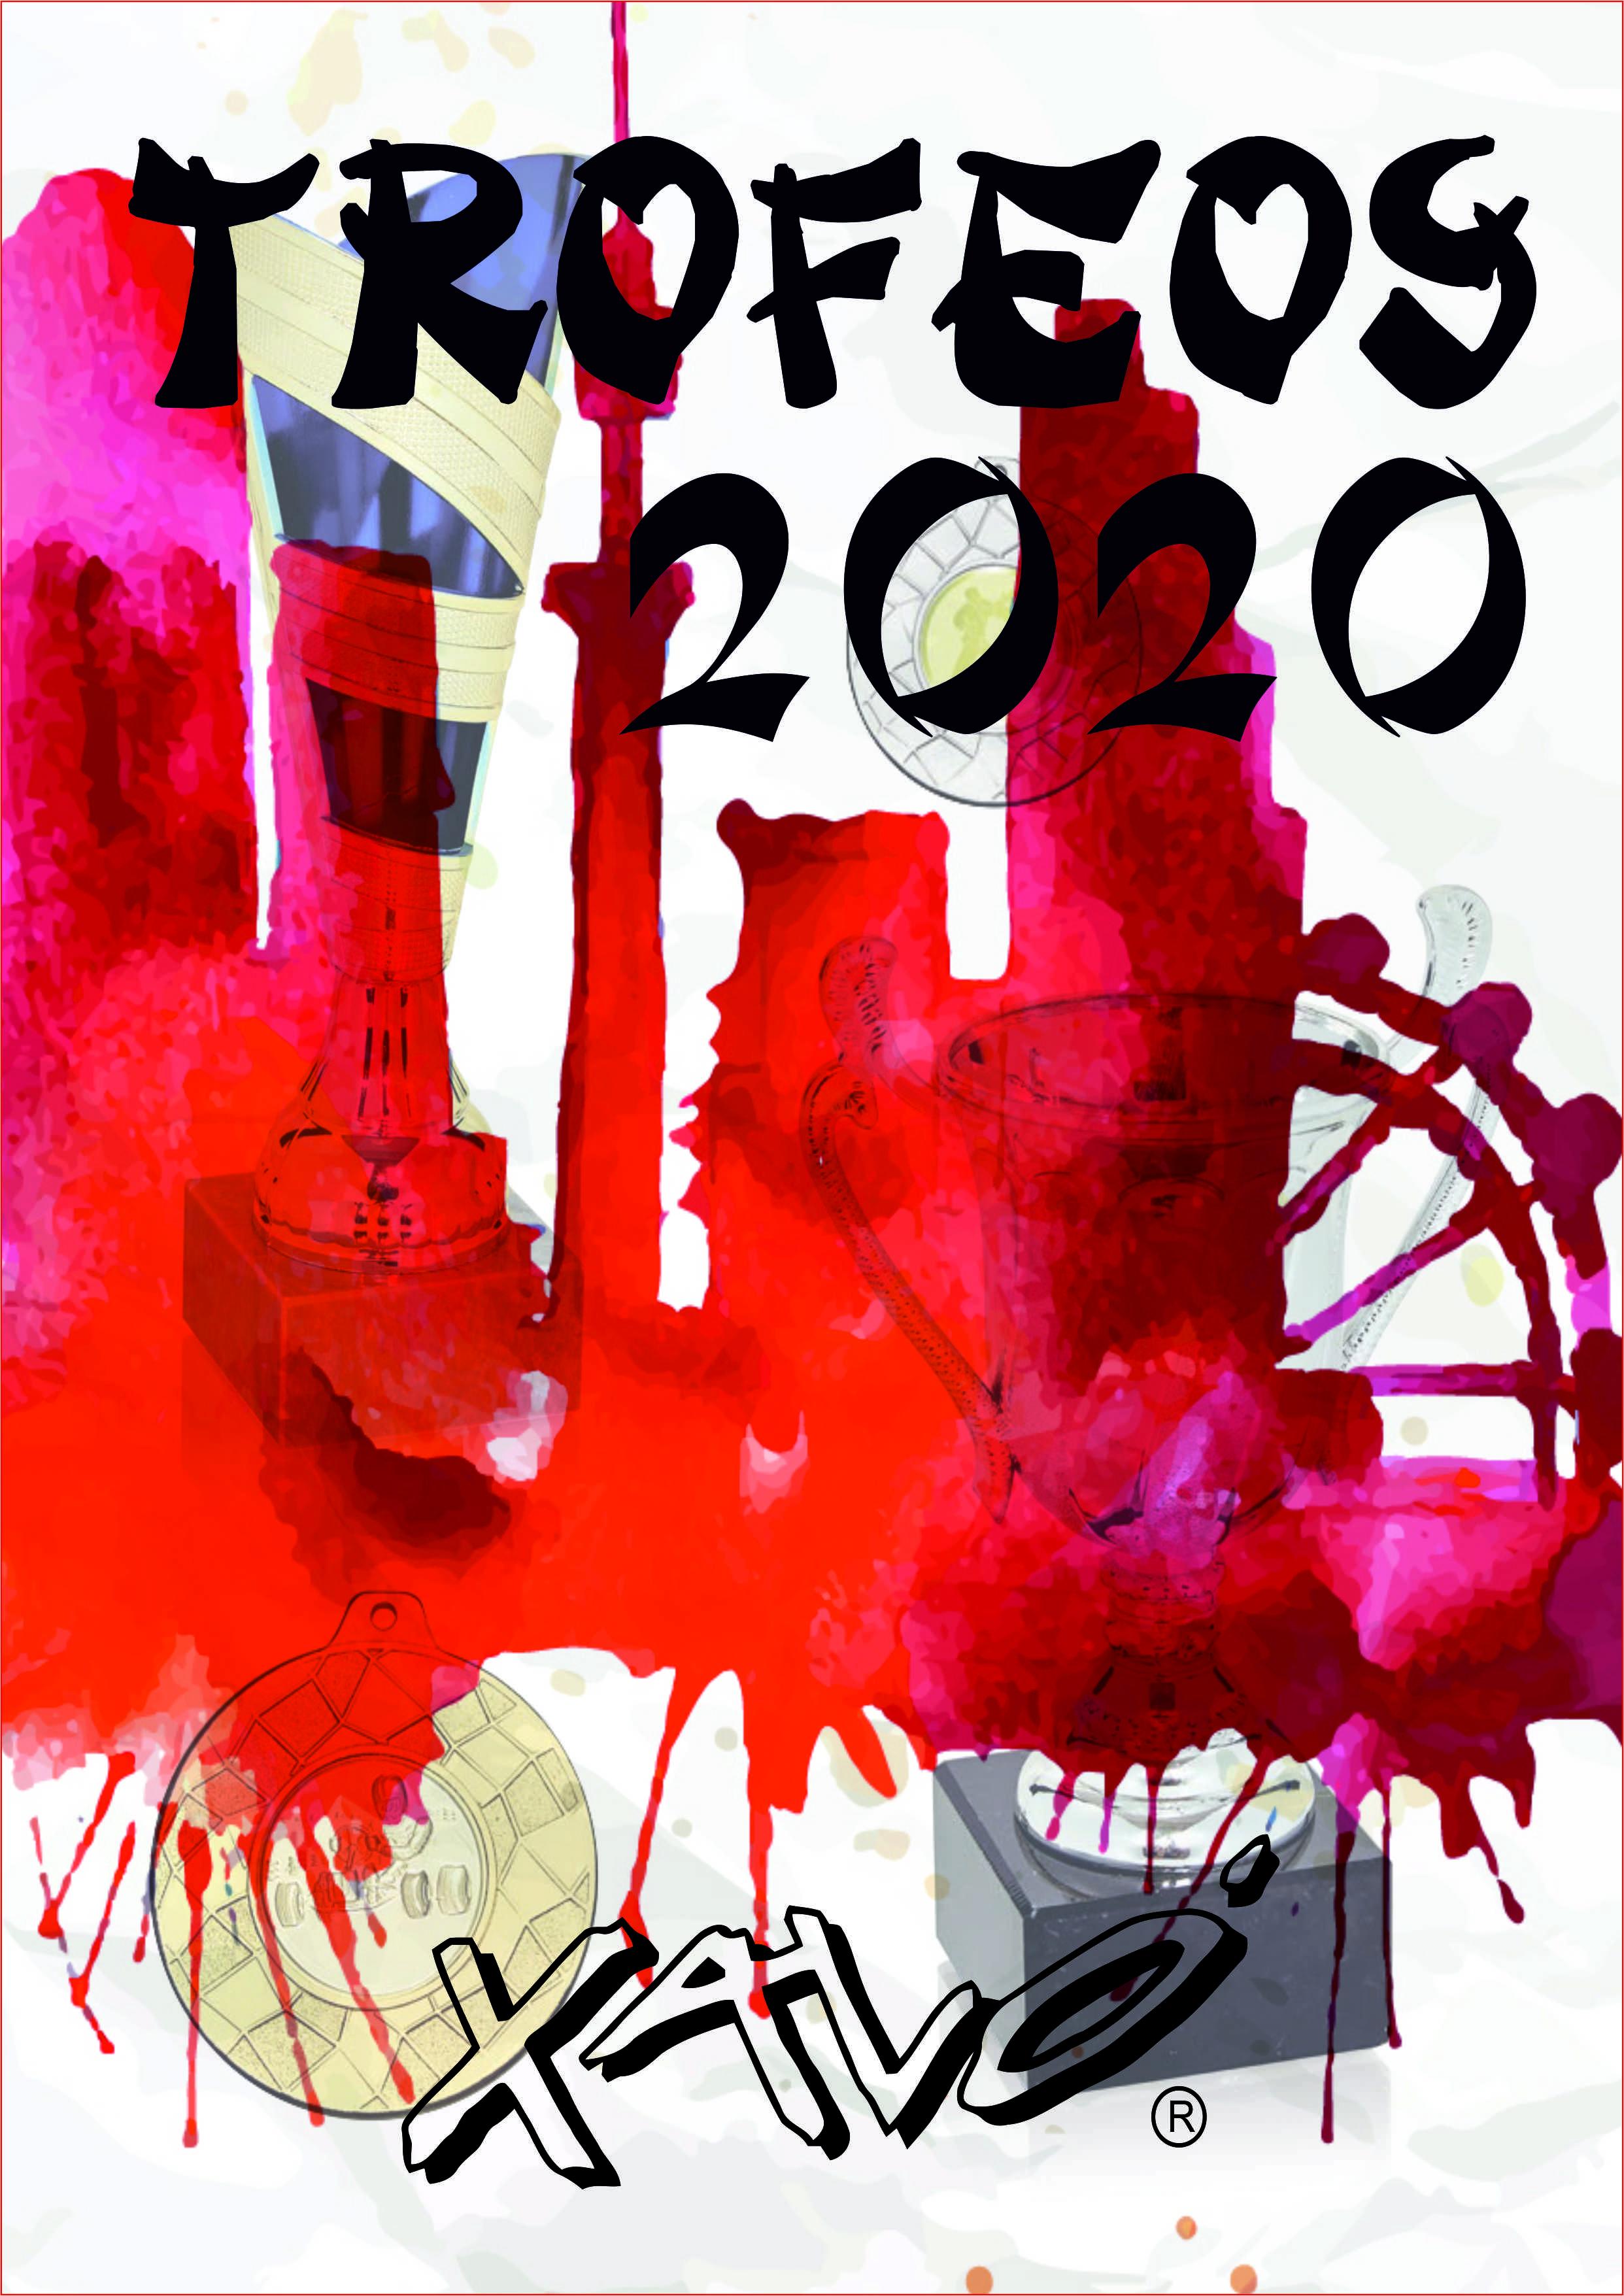 TROFEOS-2020